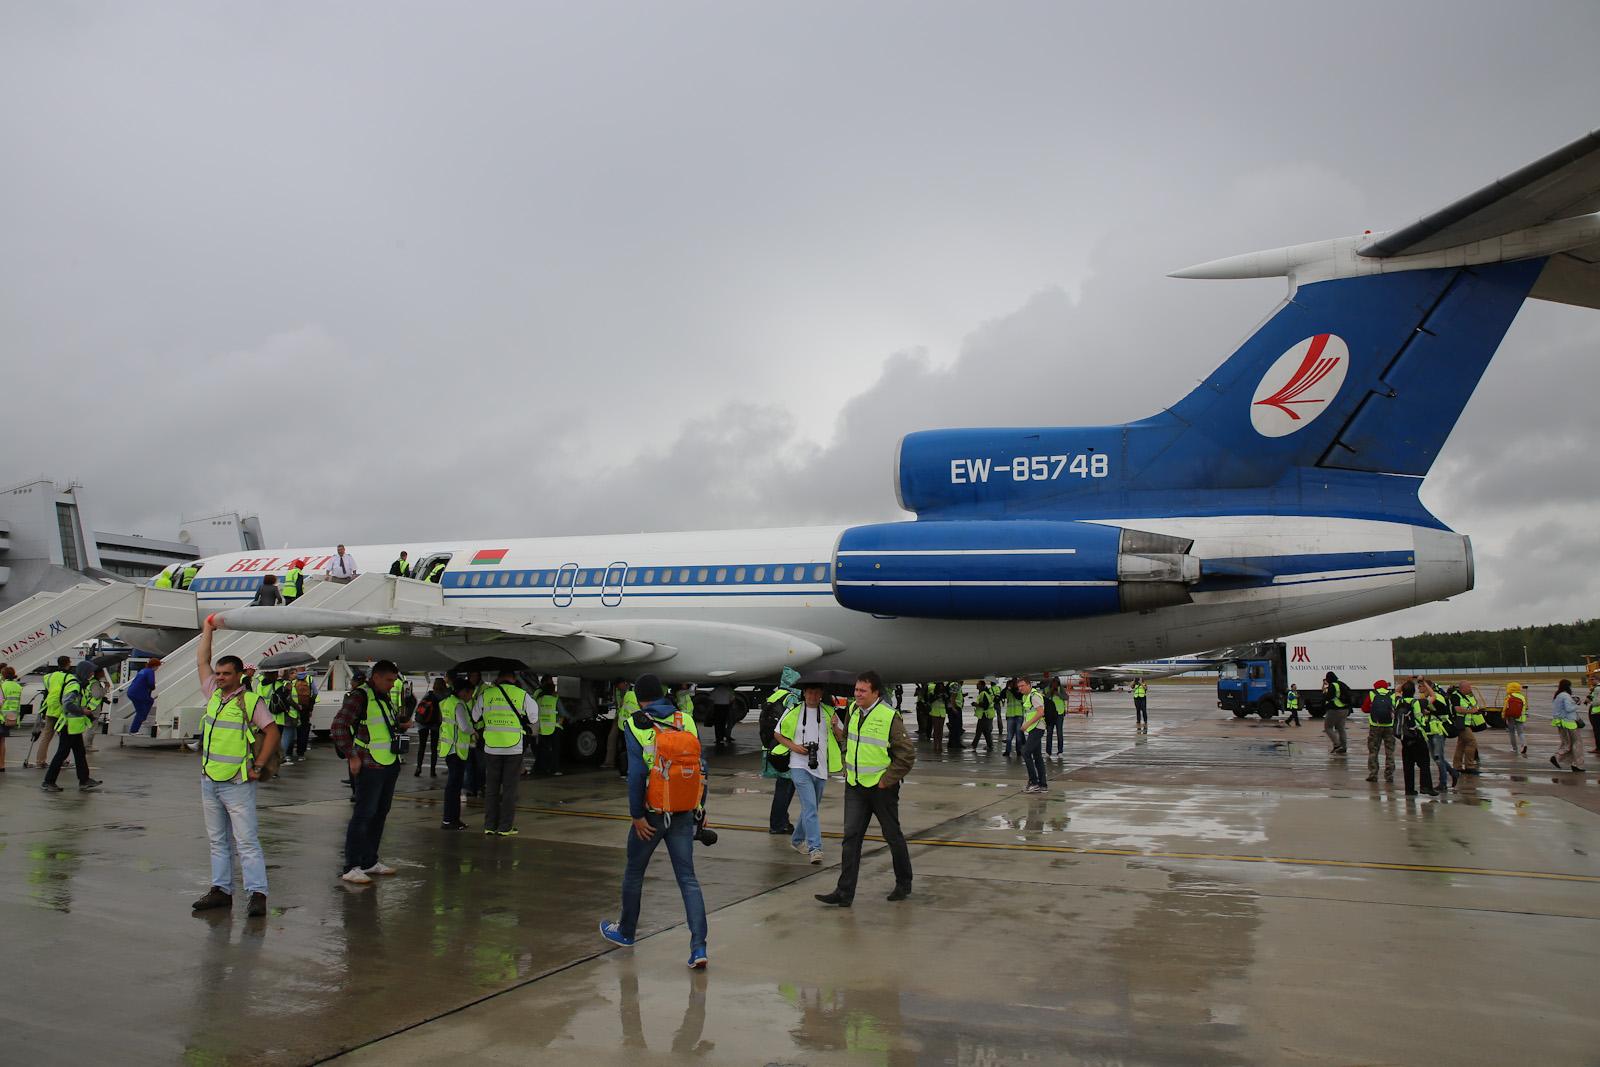 Самолет Ту-154М Белавиа в аэропорту Минска